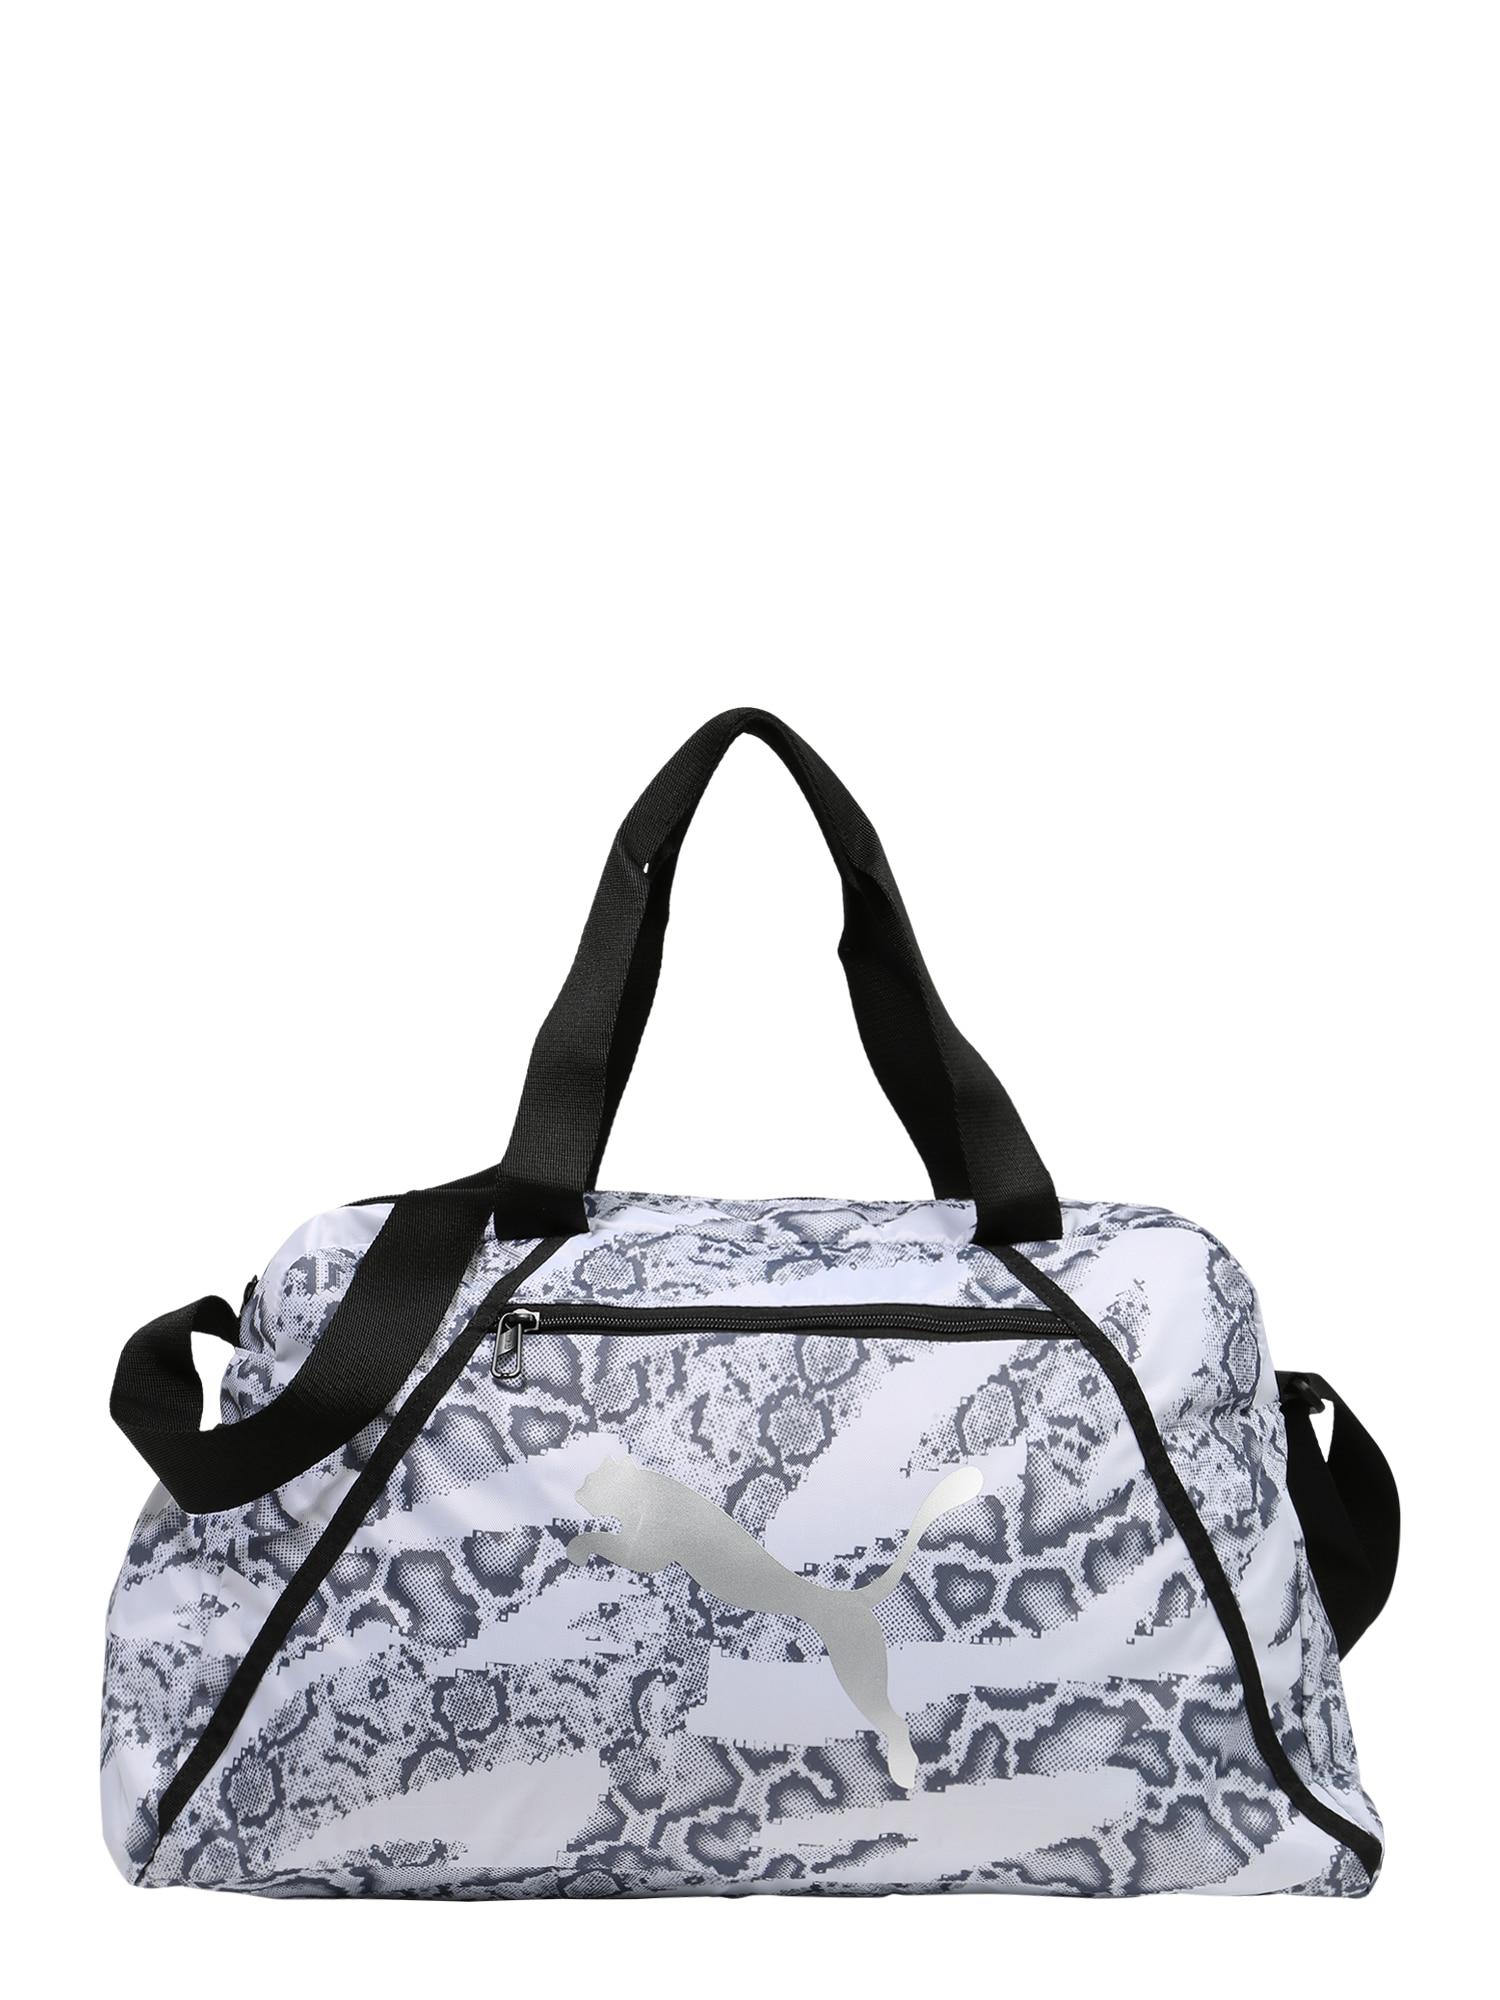 PUMA Sportinis krepšys balta / pilka